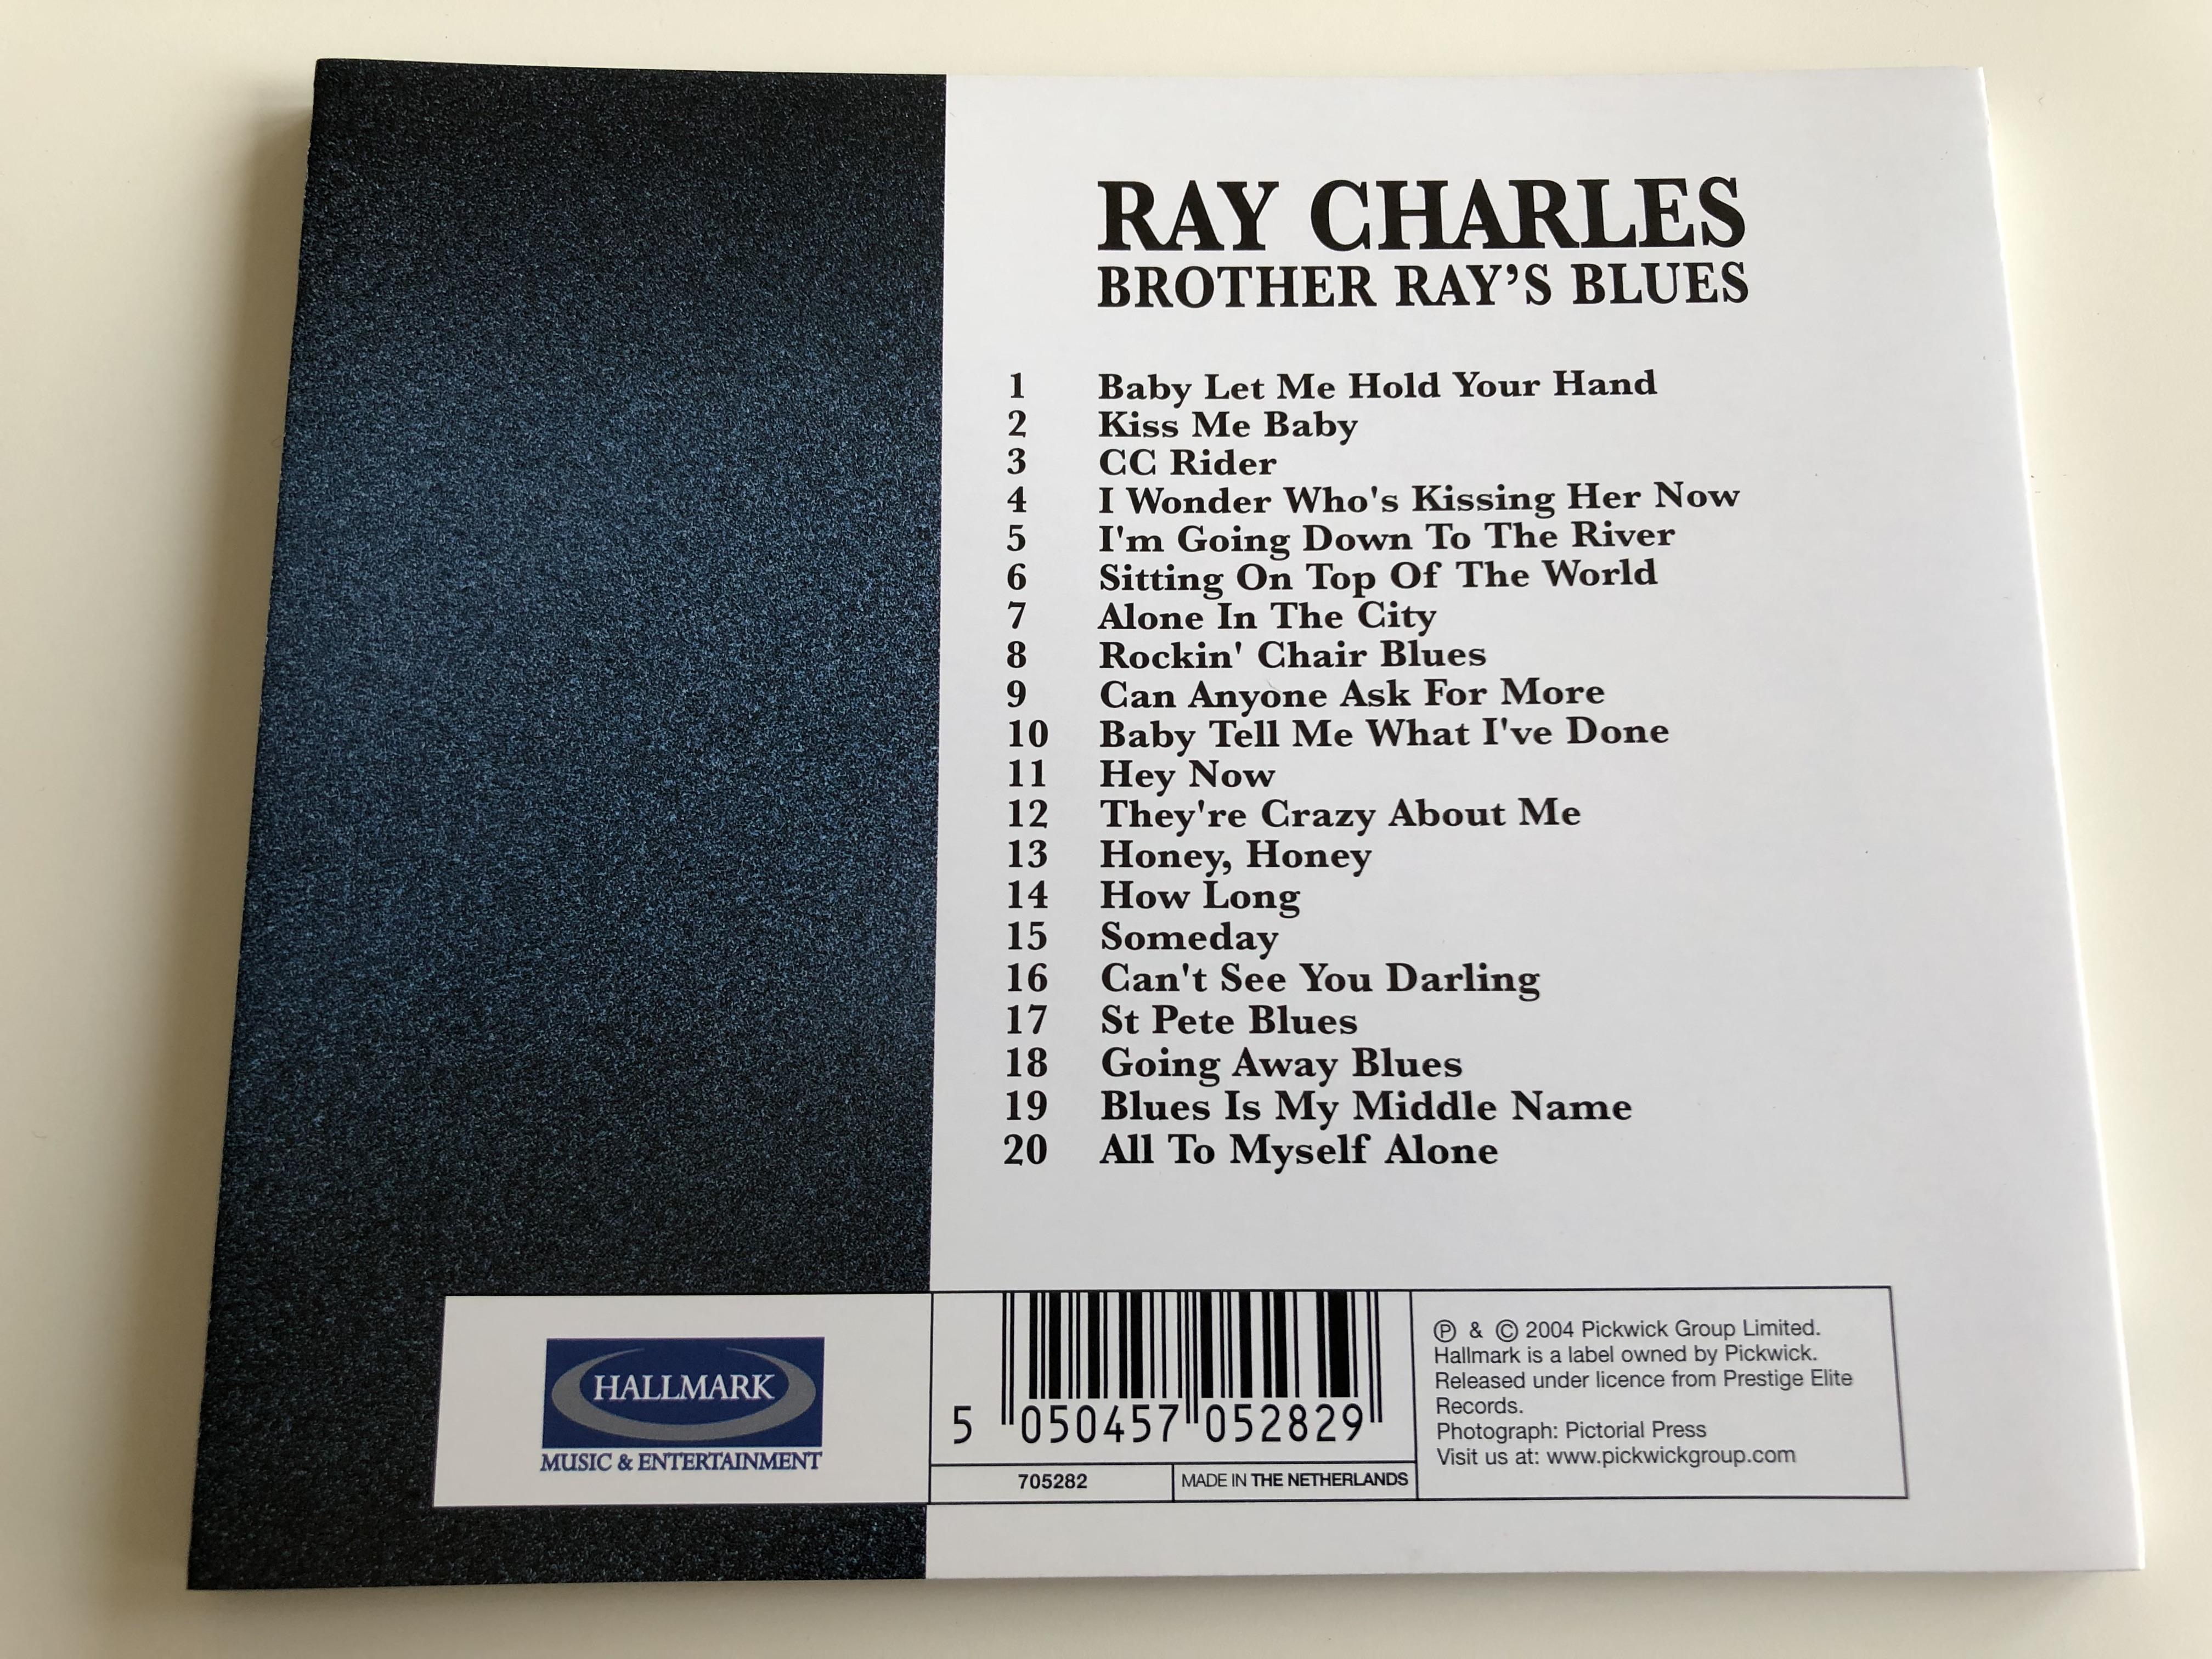 ray-charles-brothes-ray-s-bluesimg-3953.jpg